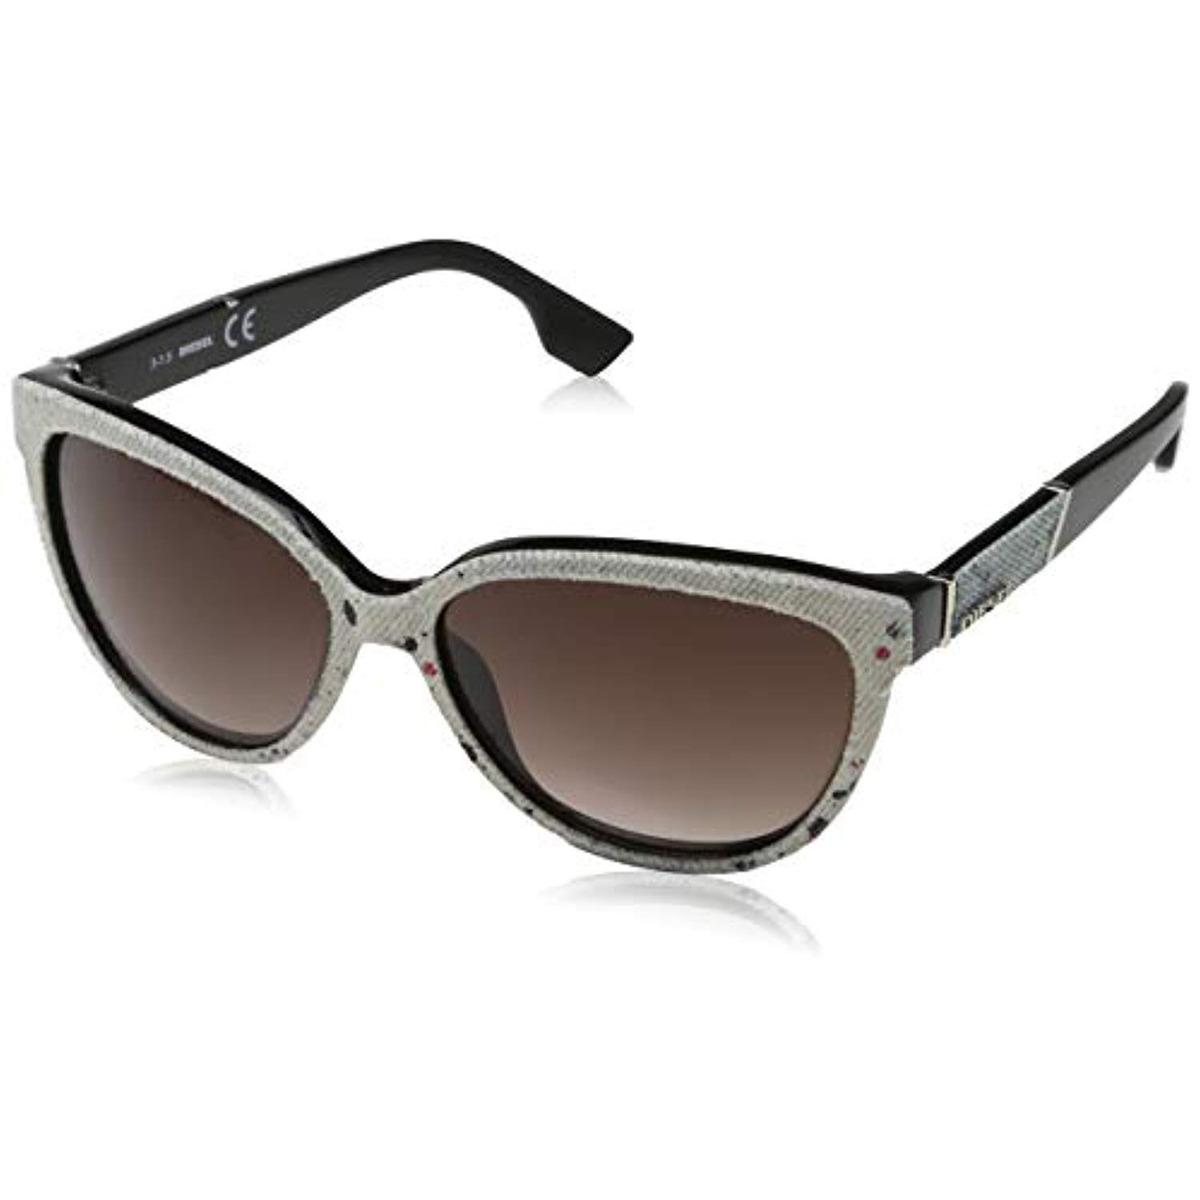 128e0a468f gafas de sol diesel dl 139 dl0139 05e black other brown. Cargando zoom.